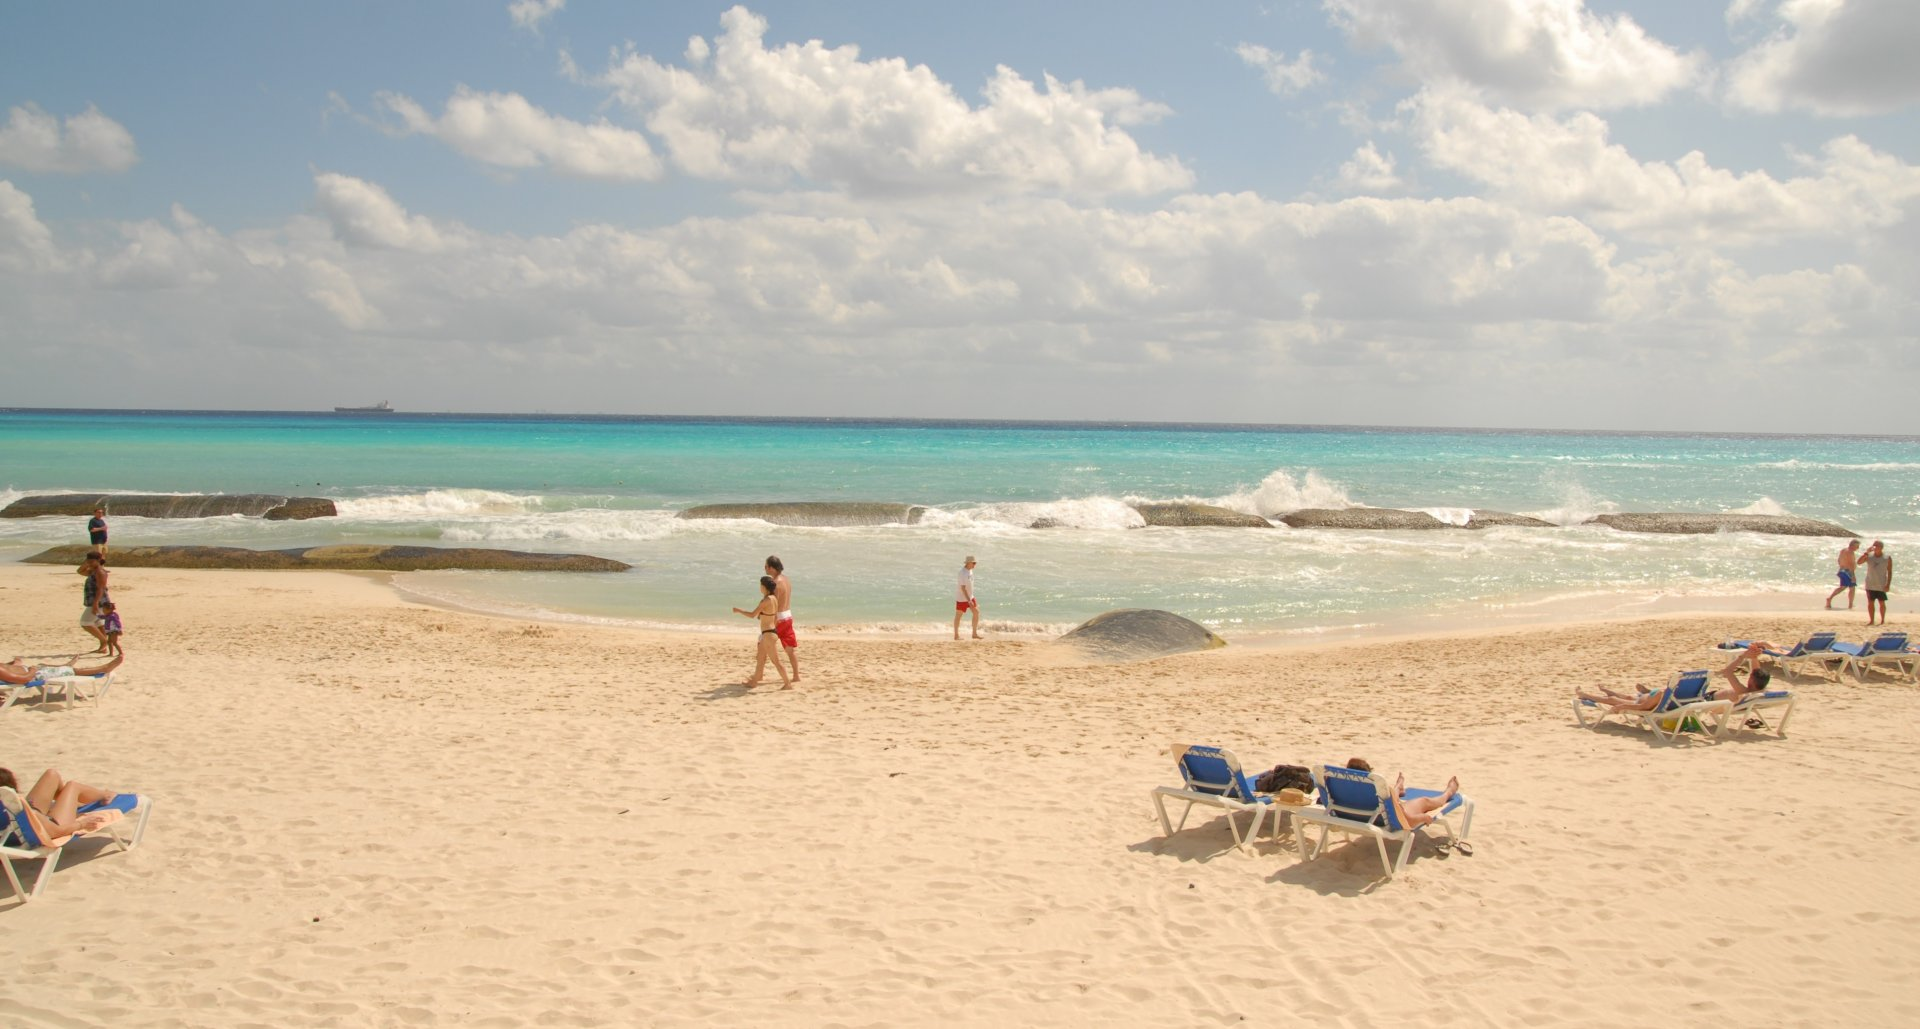 RIU Palace Beach Resort PDC 1 (43) - Copy.JPG